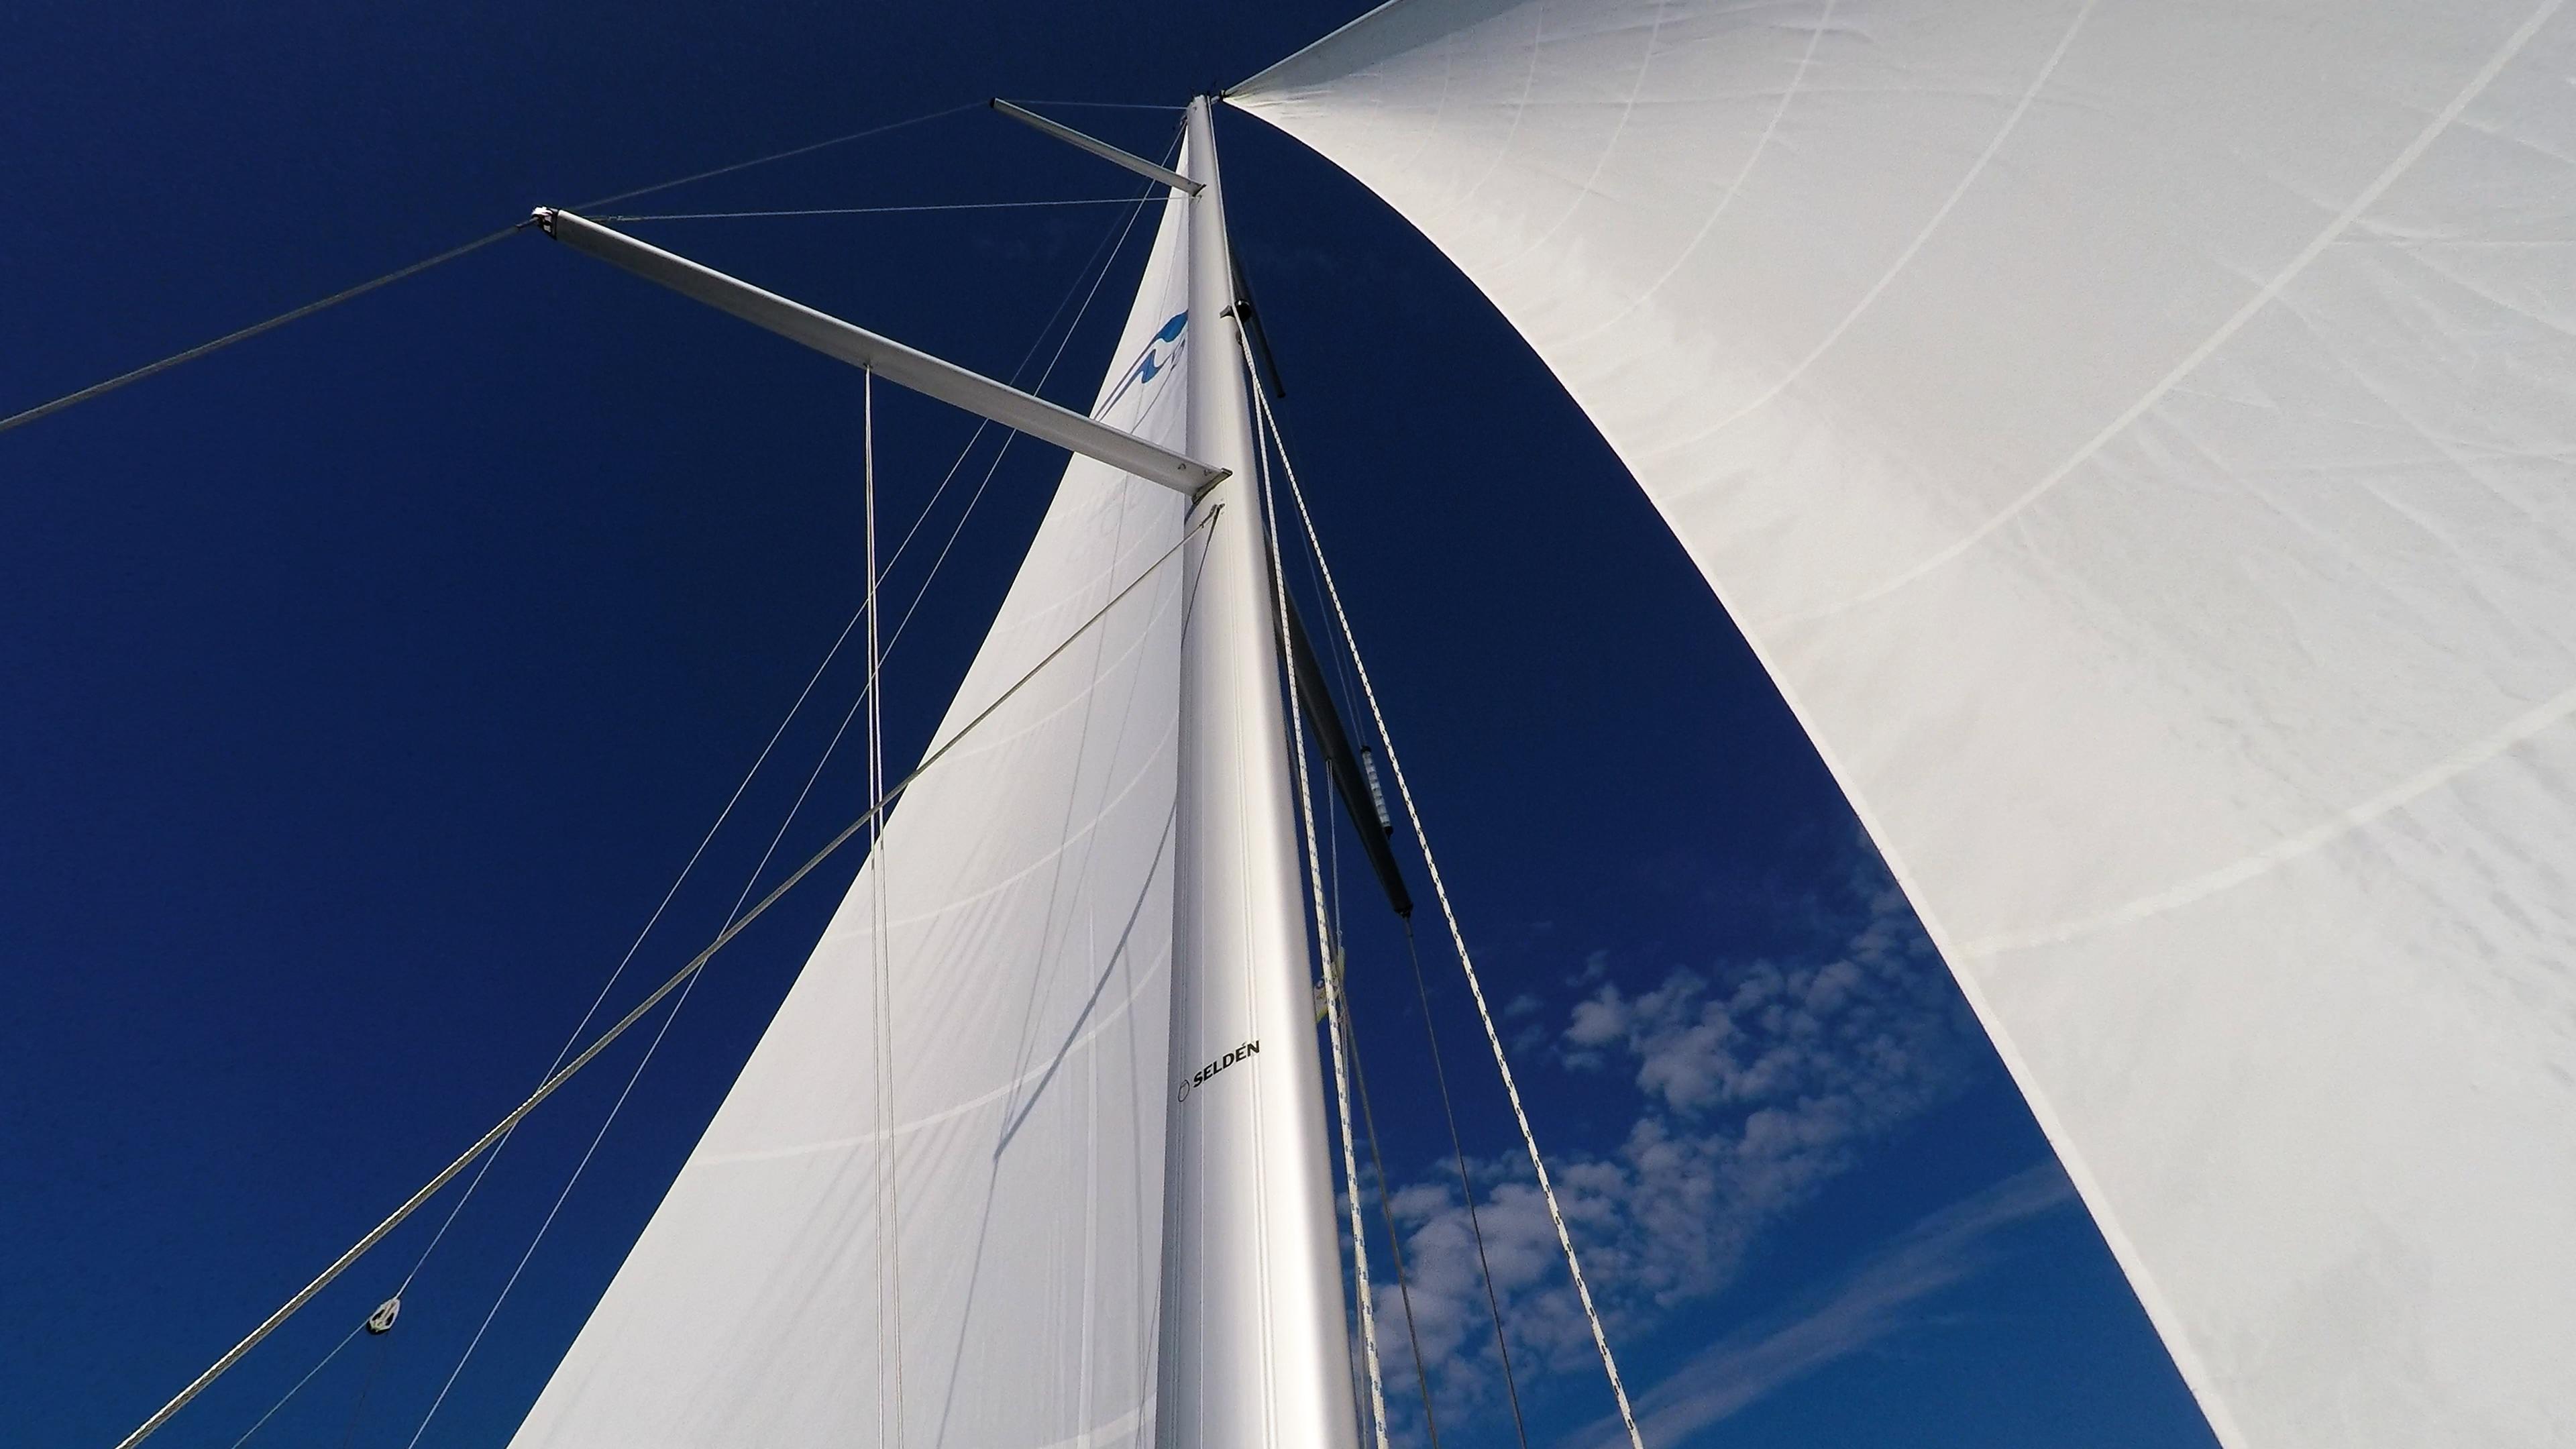 barcha a vela cielo blu vele bianche albero sartiame genova randa barca a vela veleggiare